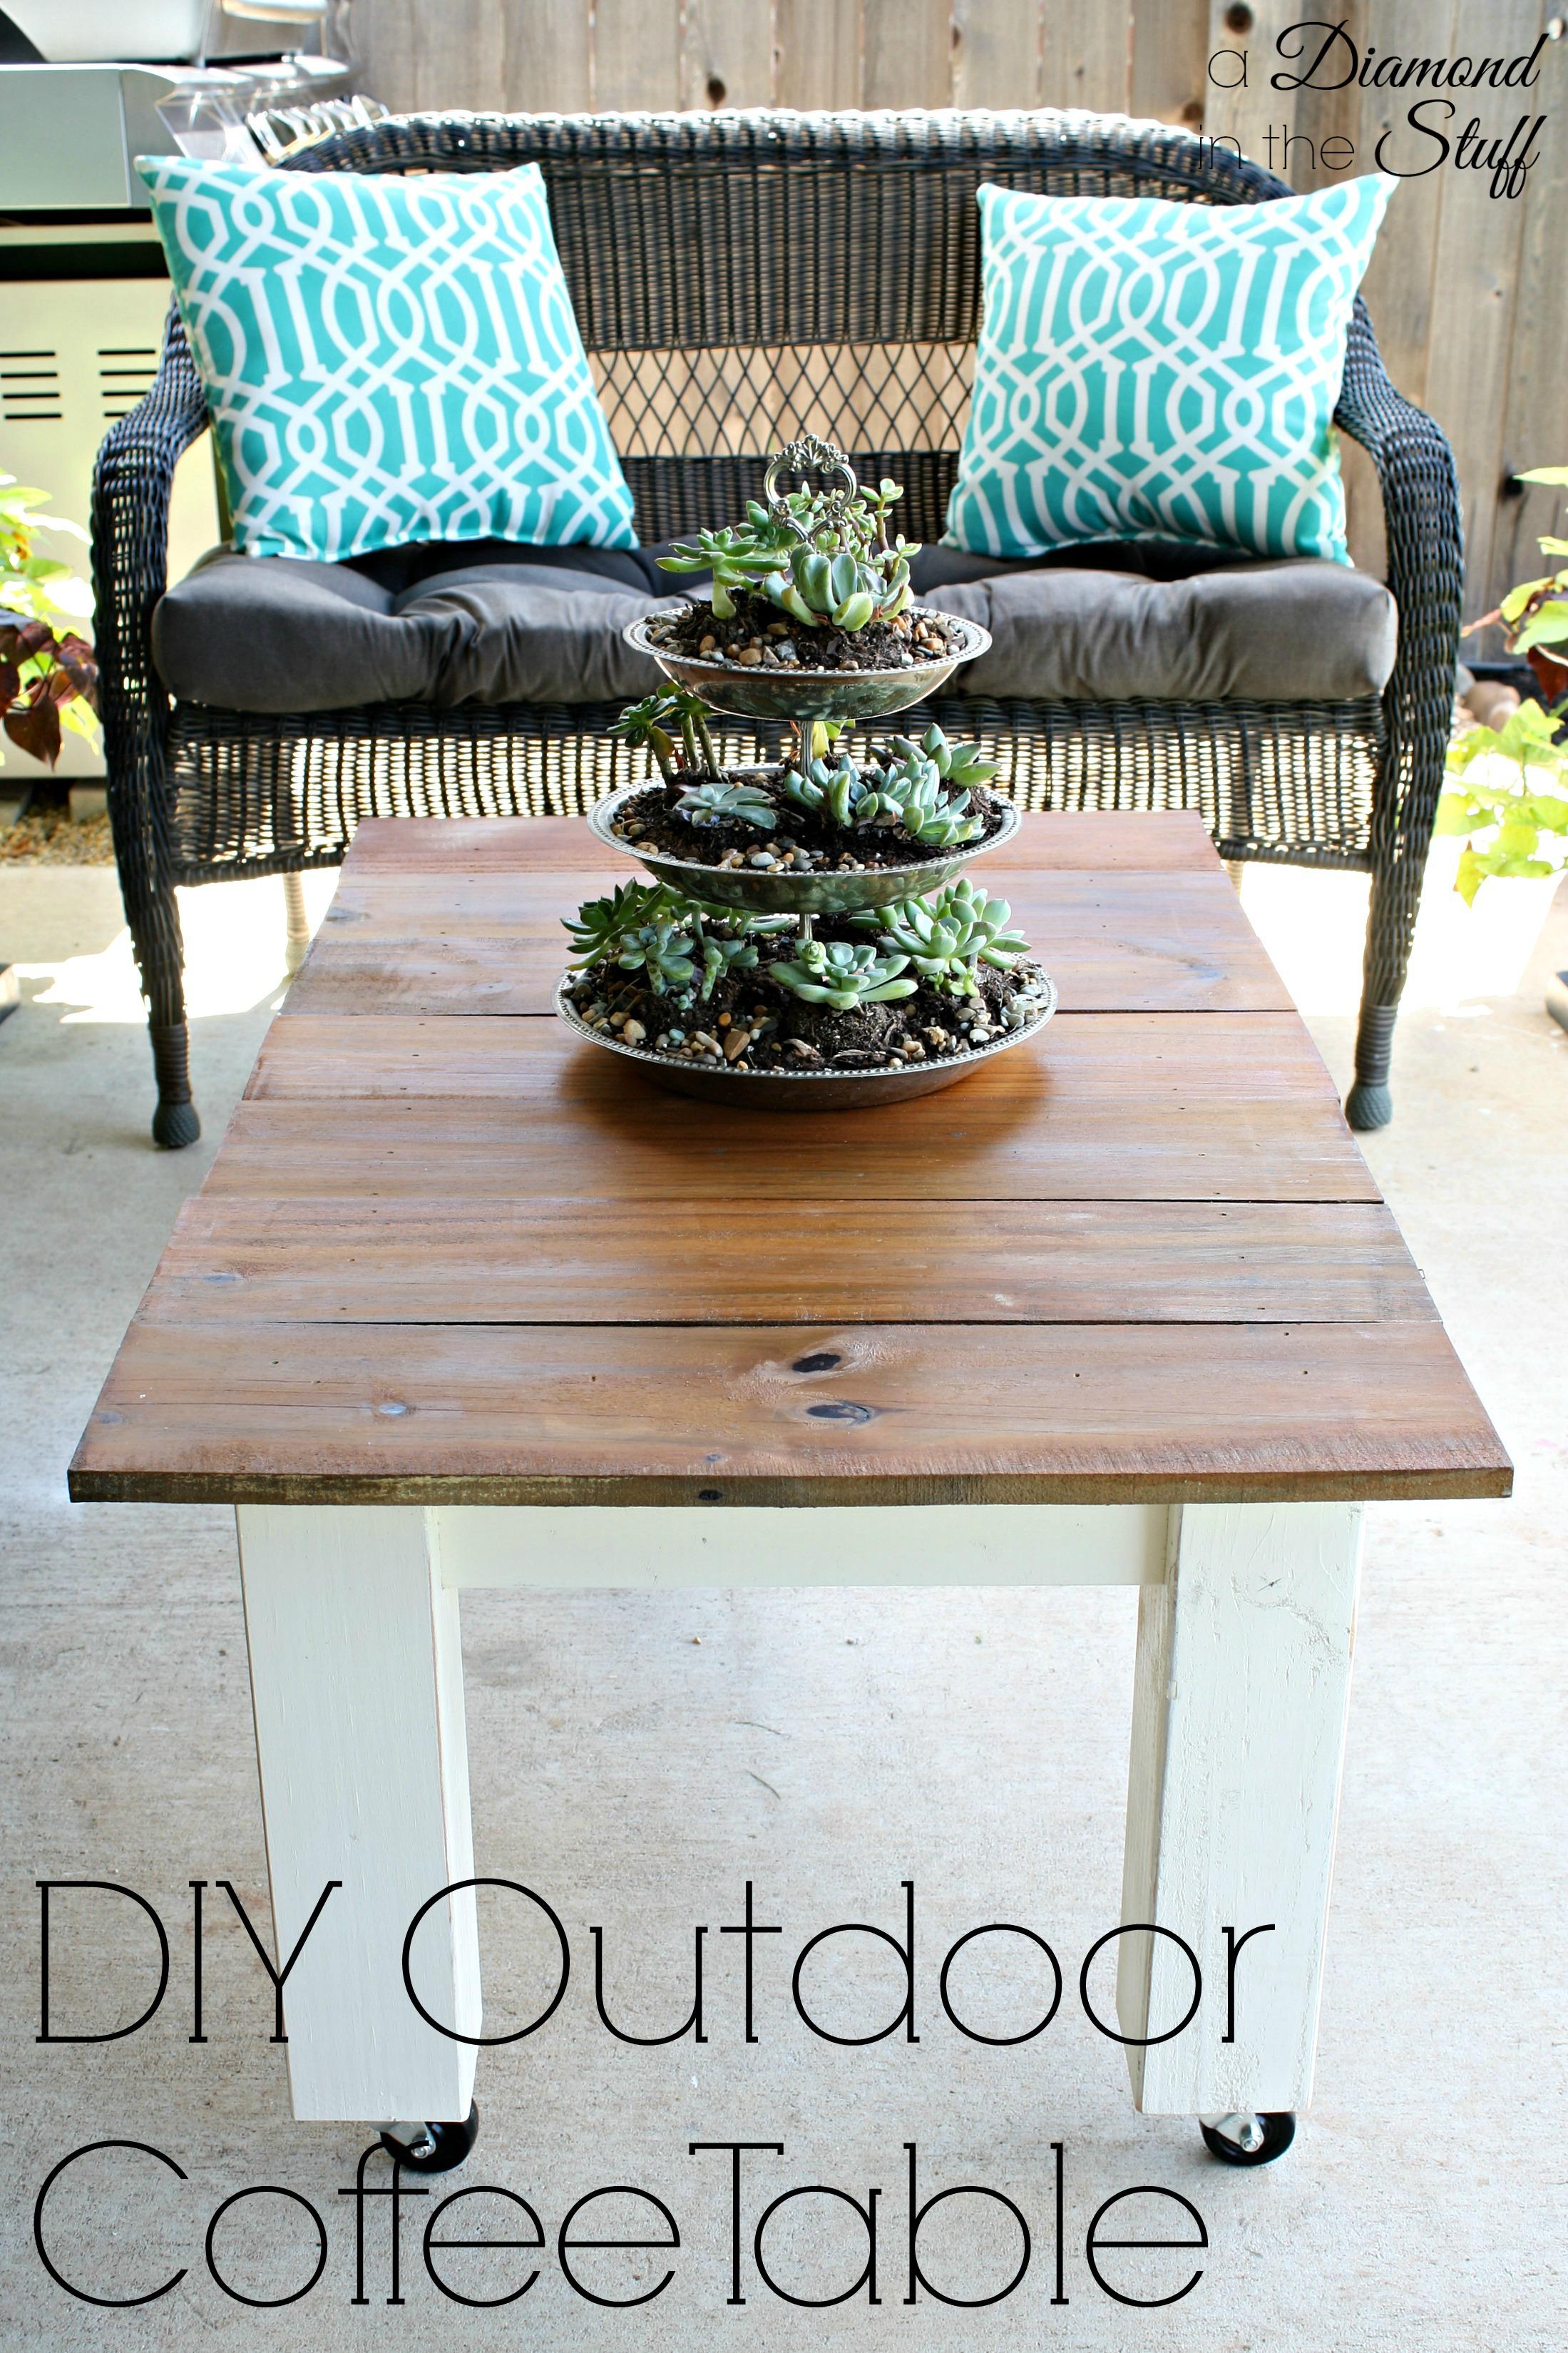 DIY Outdoor Coffee Table A Diamond in the Stuff